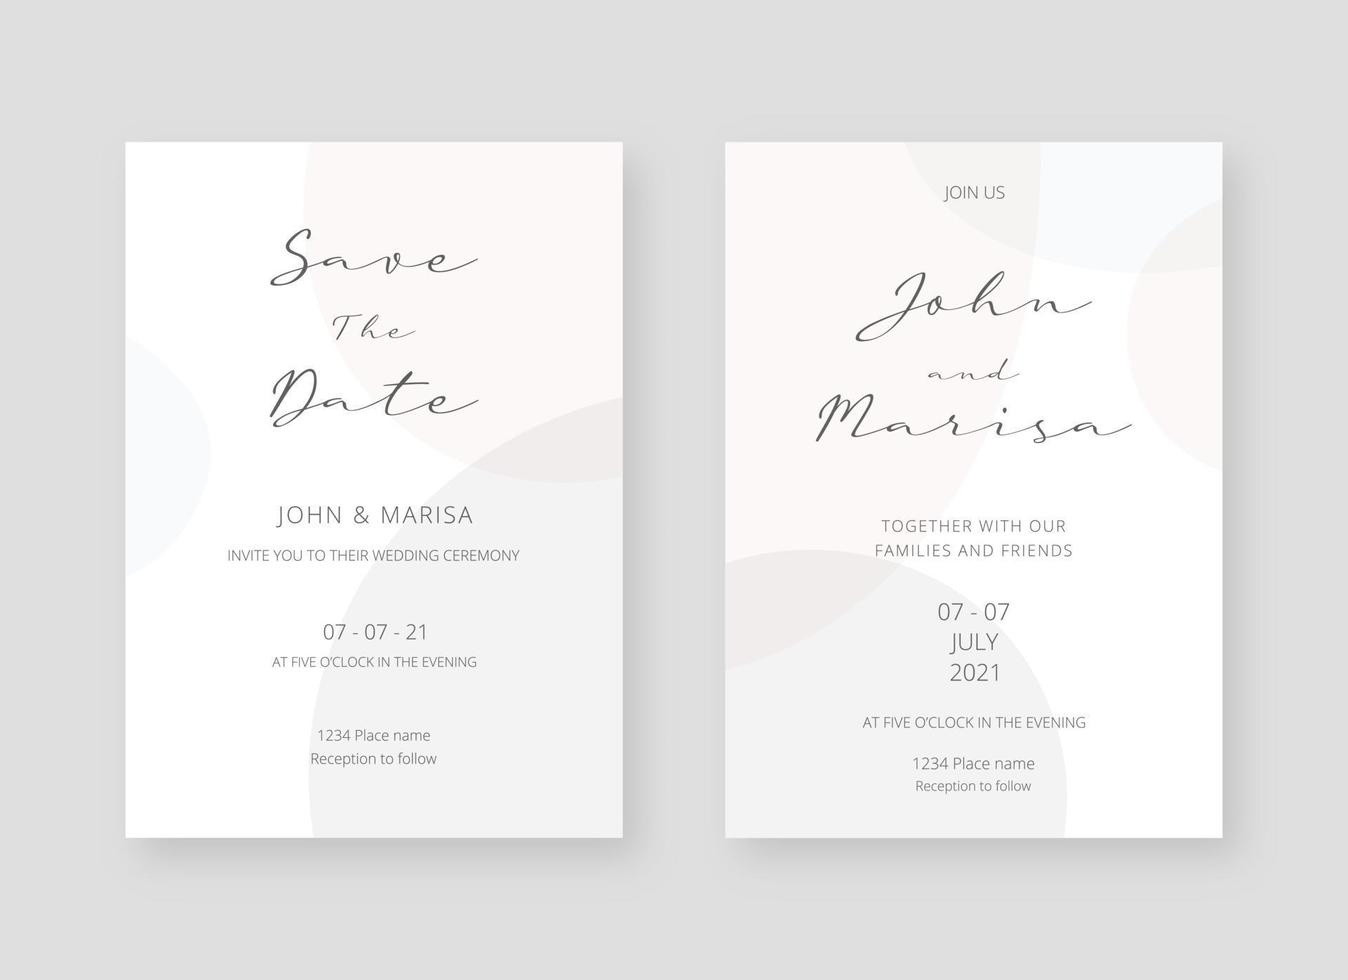 https www vecteezy com vector art 2065622 invitation card template set of wedding invitation card template design vector decorative design background